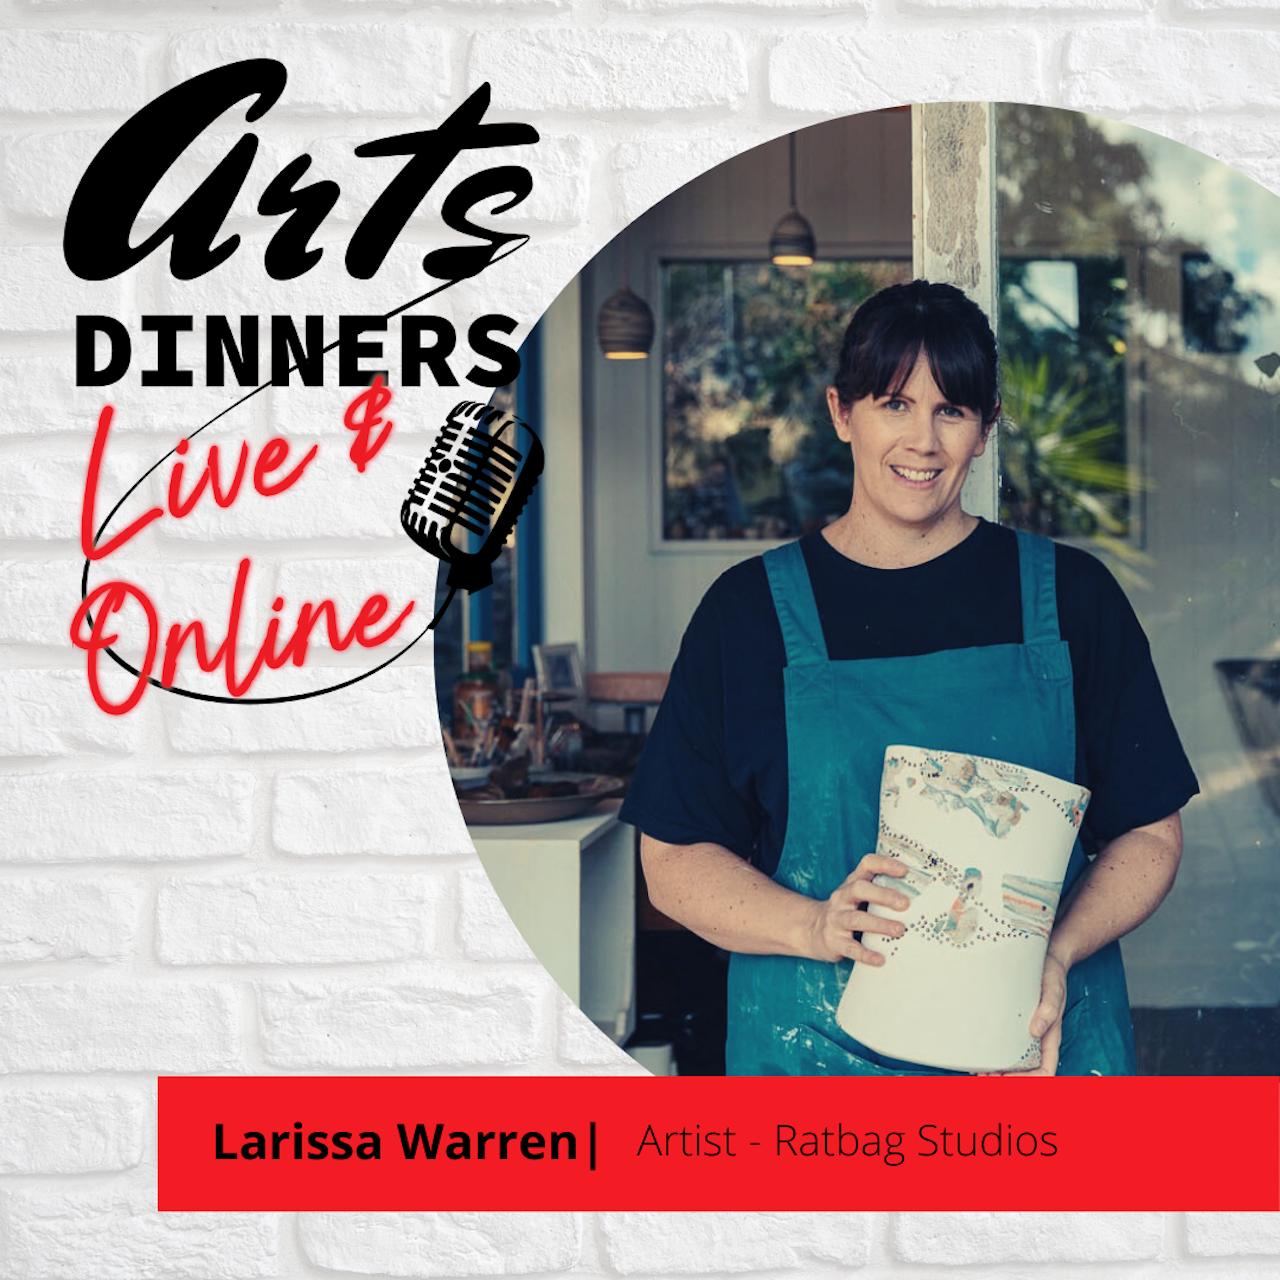 Larissa Warren